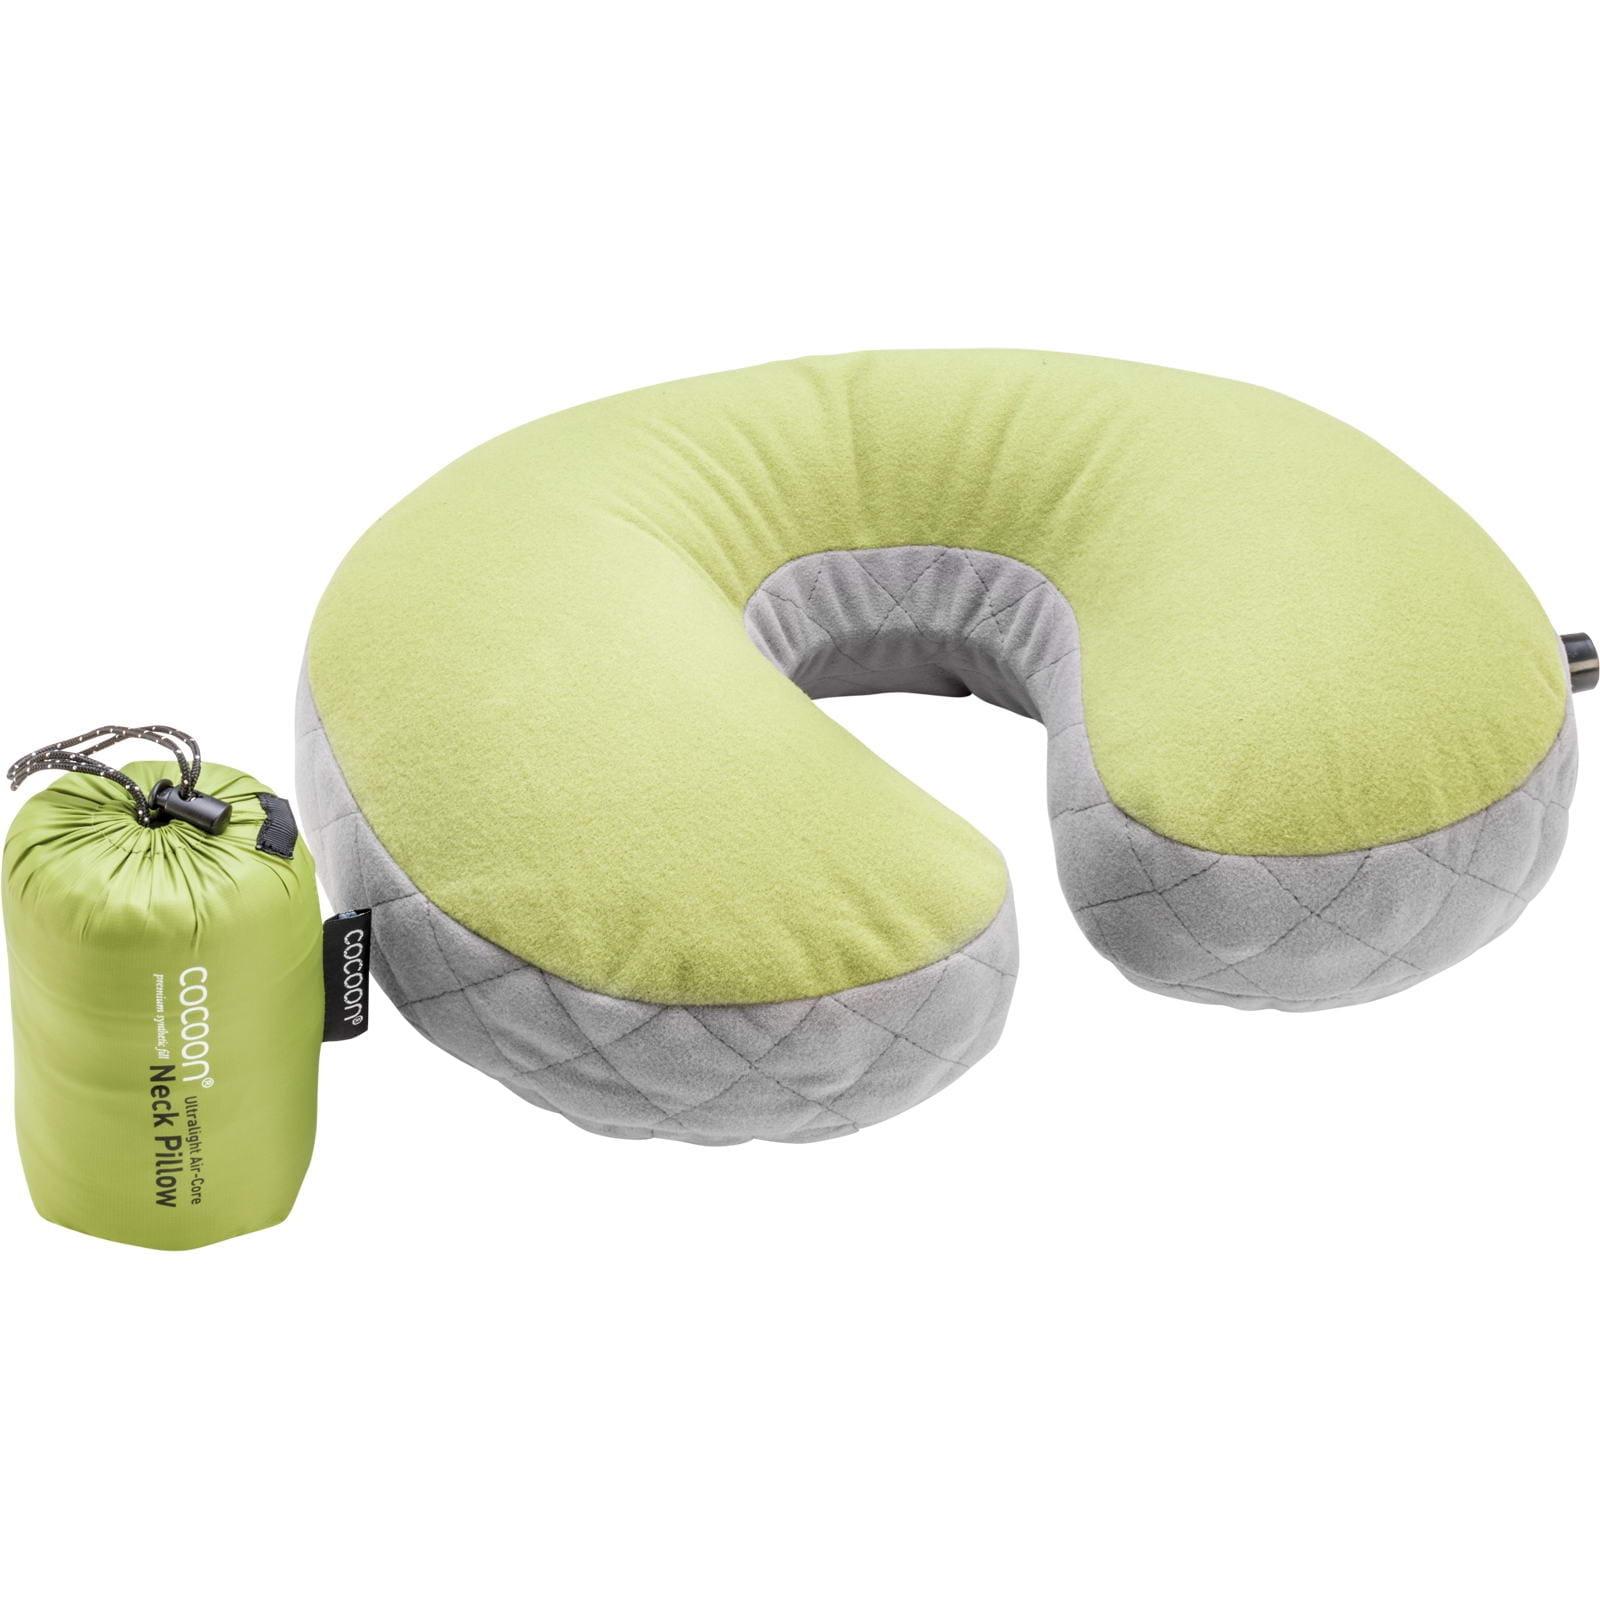 COCOON Air-Core U-Shaped Neck Pillow - Nackenkissen wasabi-grey - Bild 3